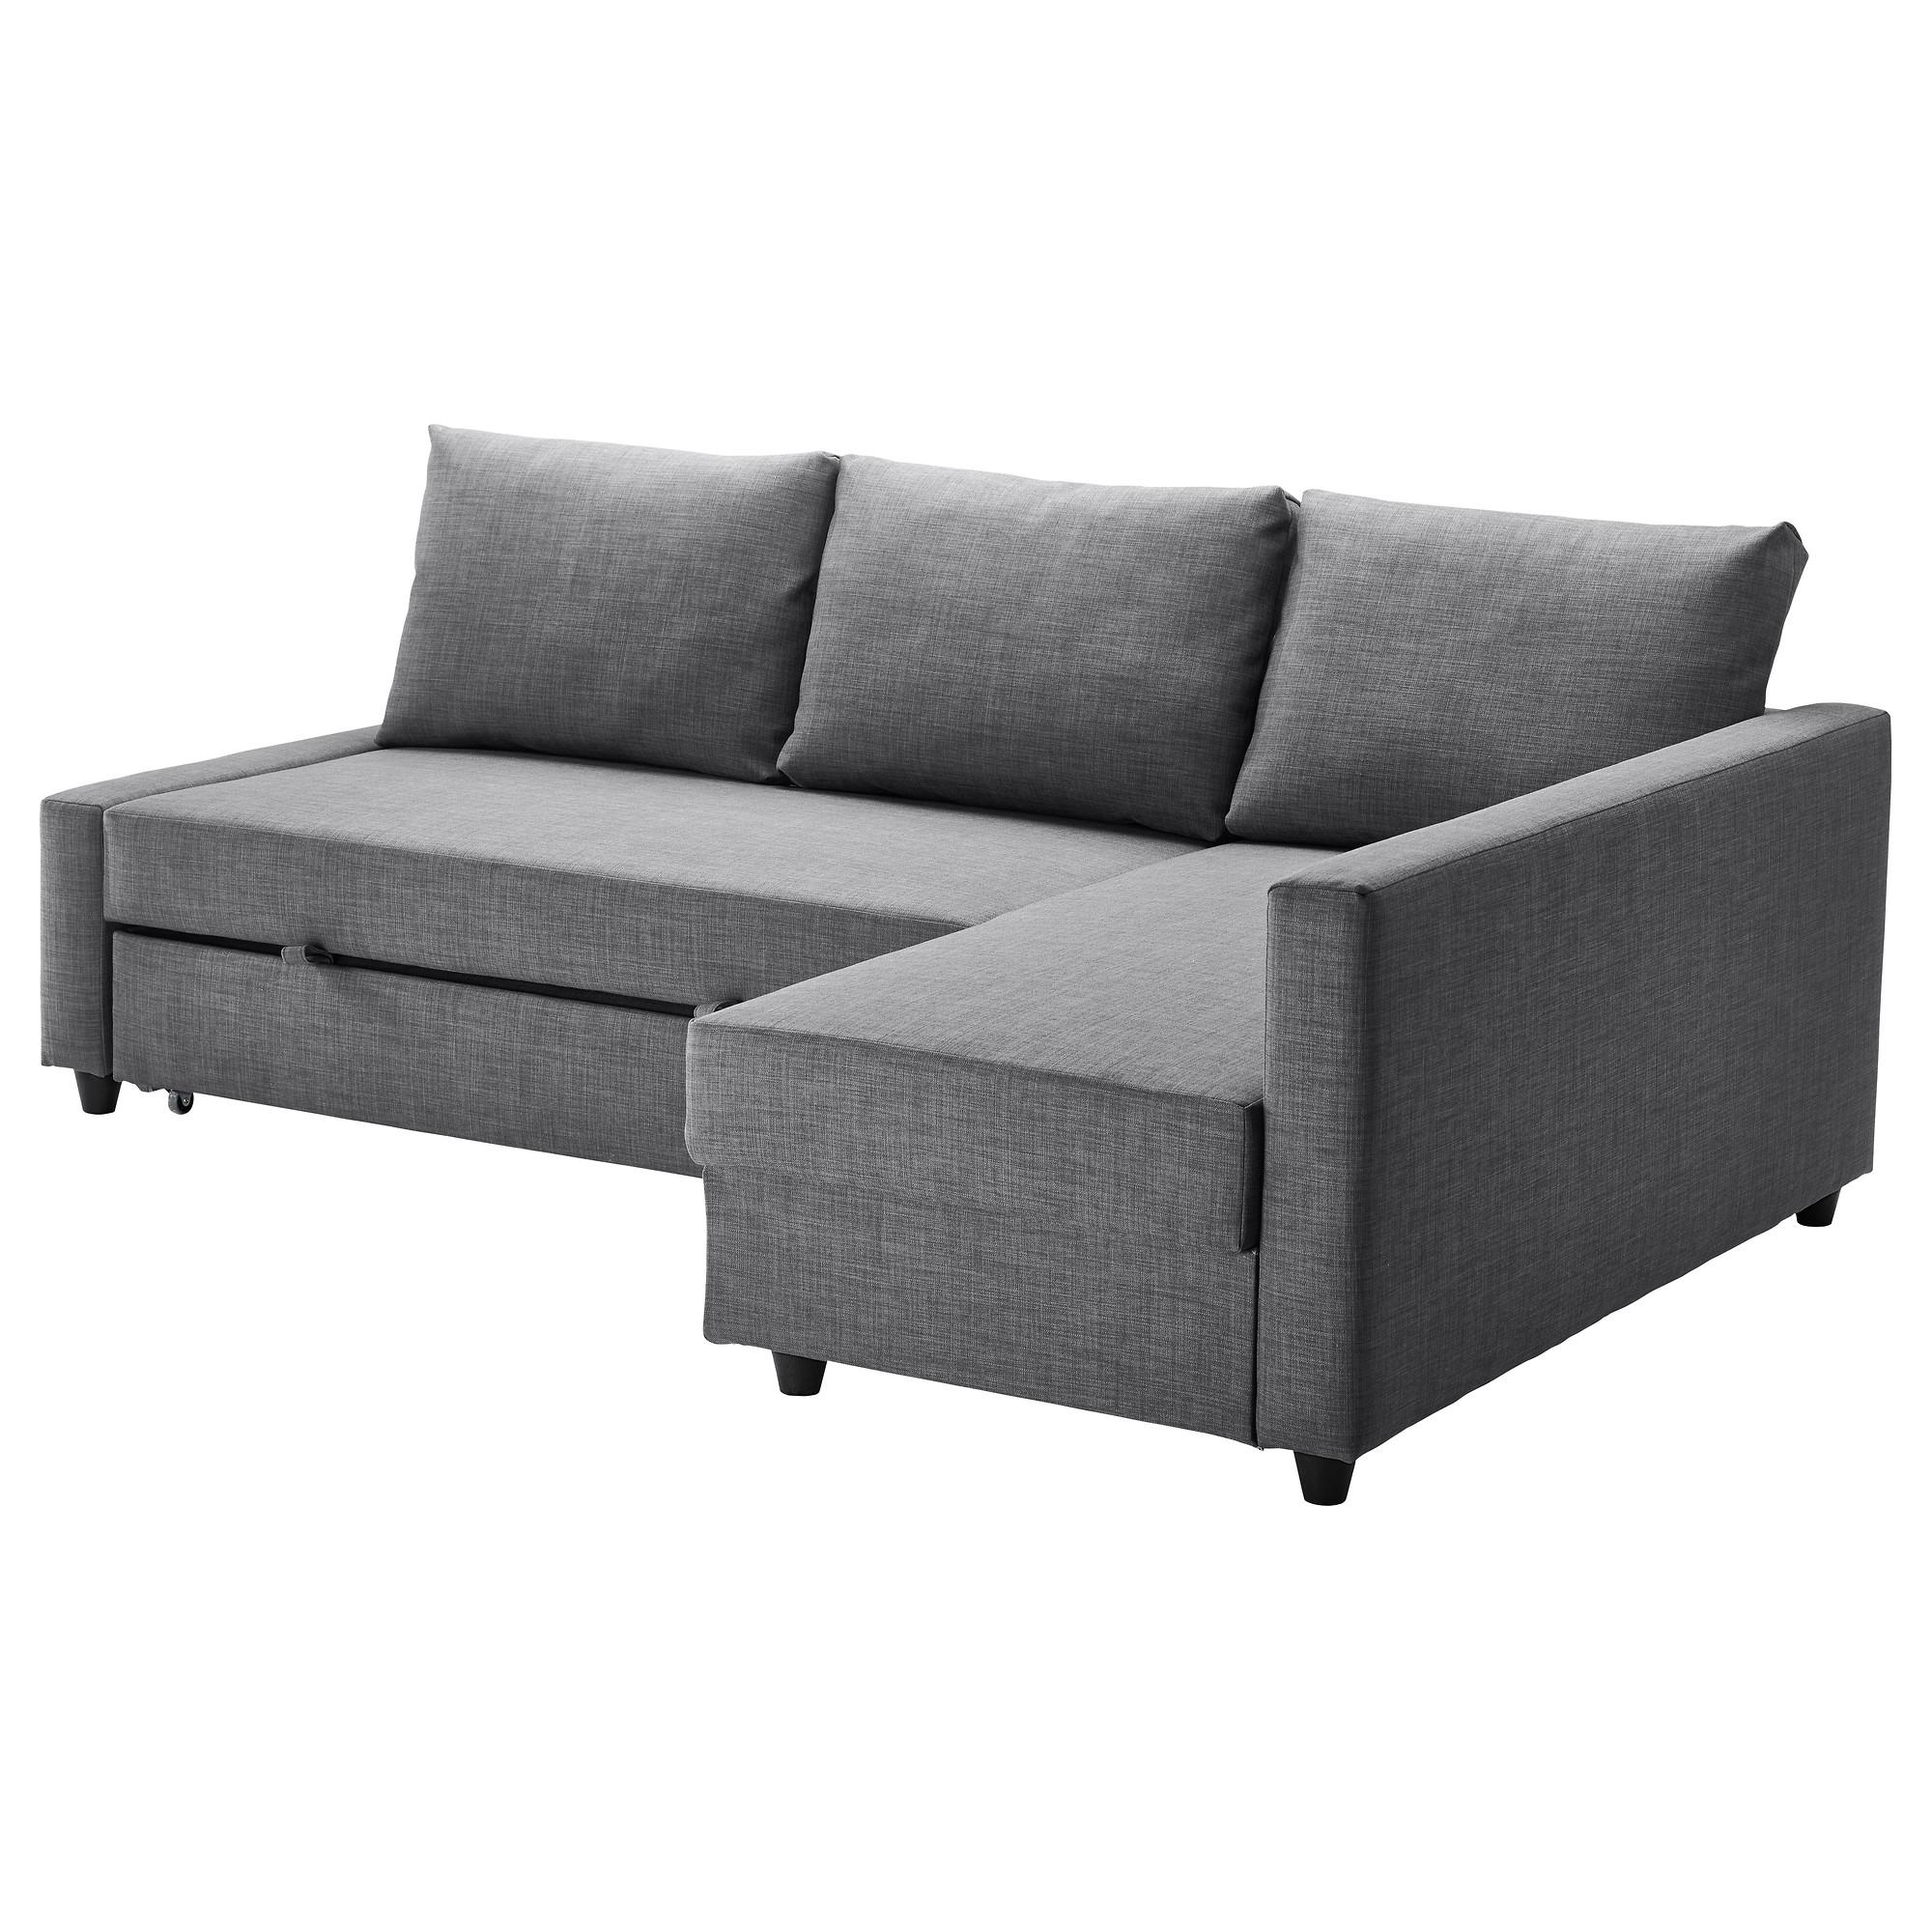 Friheten Corner Sofa Bed With Storage Skiftebo Dark Grey – Ikea With Regard To Ikea Corner Sofa Bed With Storage (Image 9 of 20)